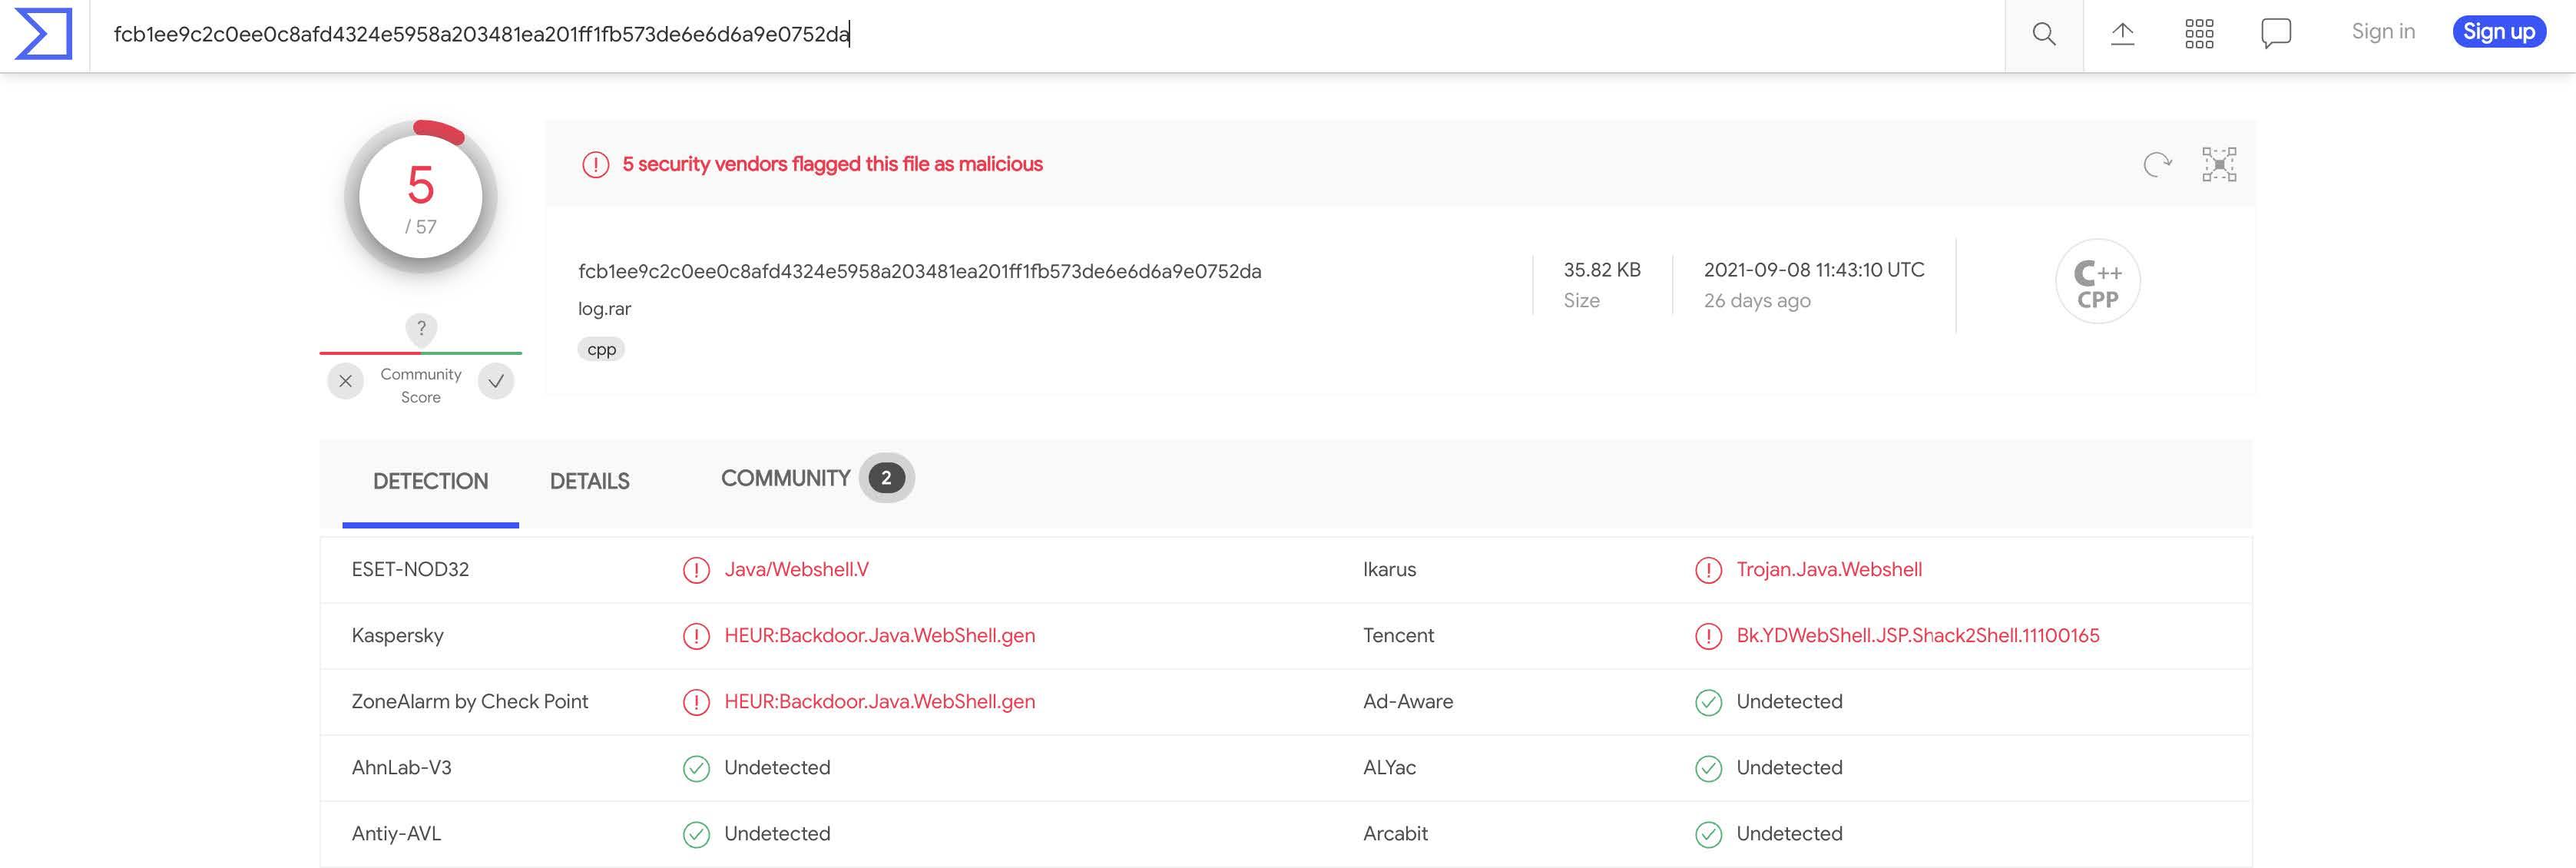 IronNet-Blog-Continued Exploitation-Five security vendors